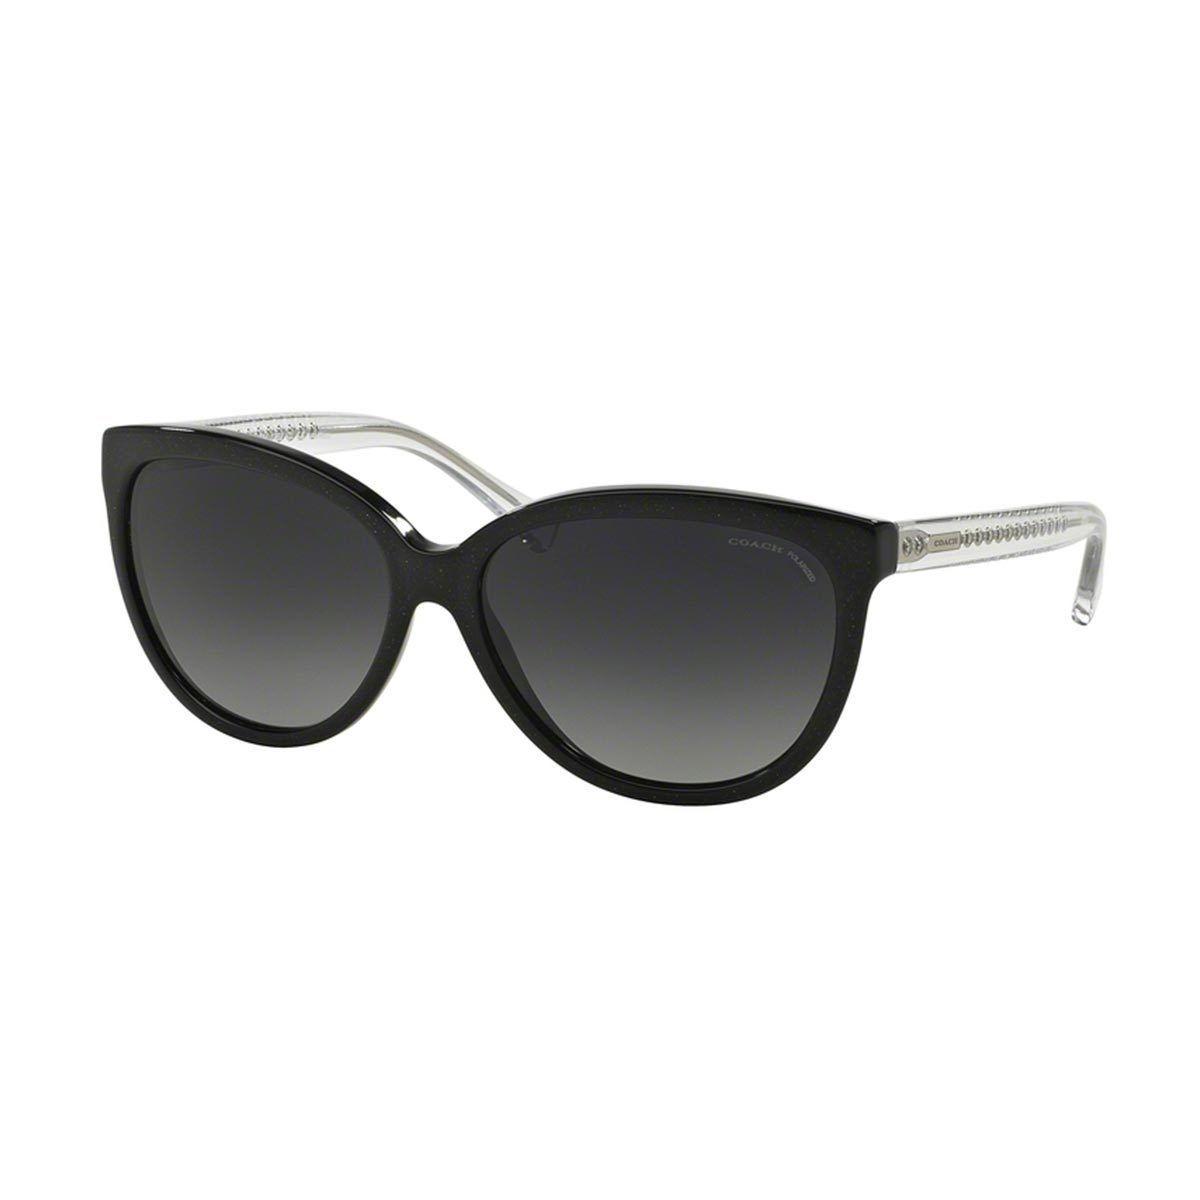 95d38d6068516 Coach Women s HC8153 Black Plastic Square Polarized Sunglasses (Black  Glitter Crystal Grey Gradient Polar)